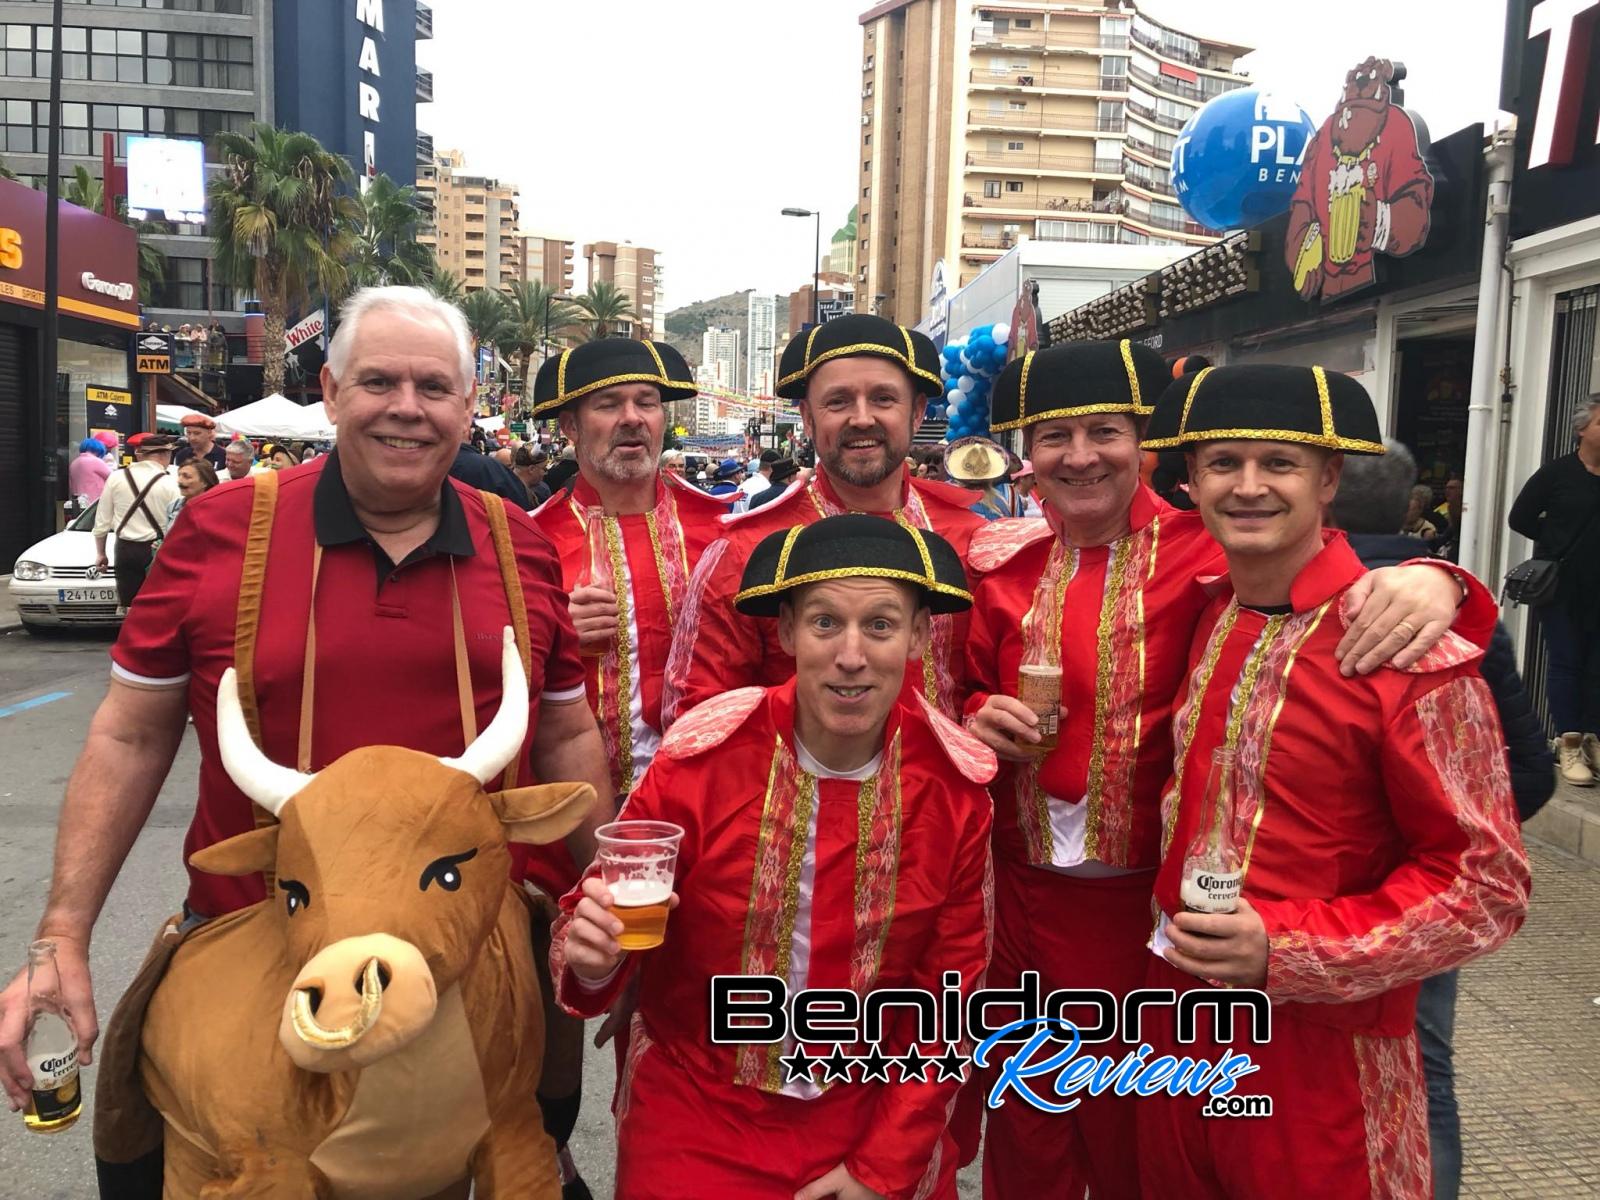 Benidorm-Fiestas-2019-Fancy-Dress-184